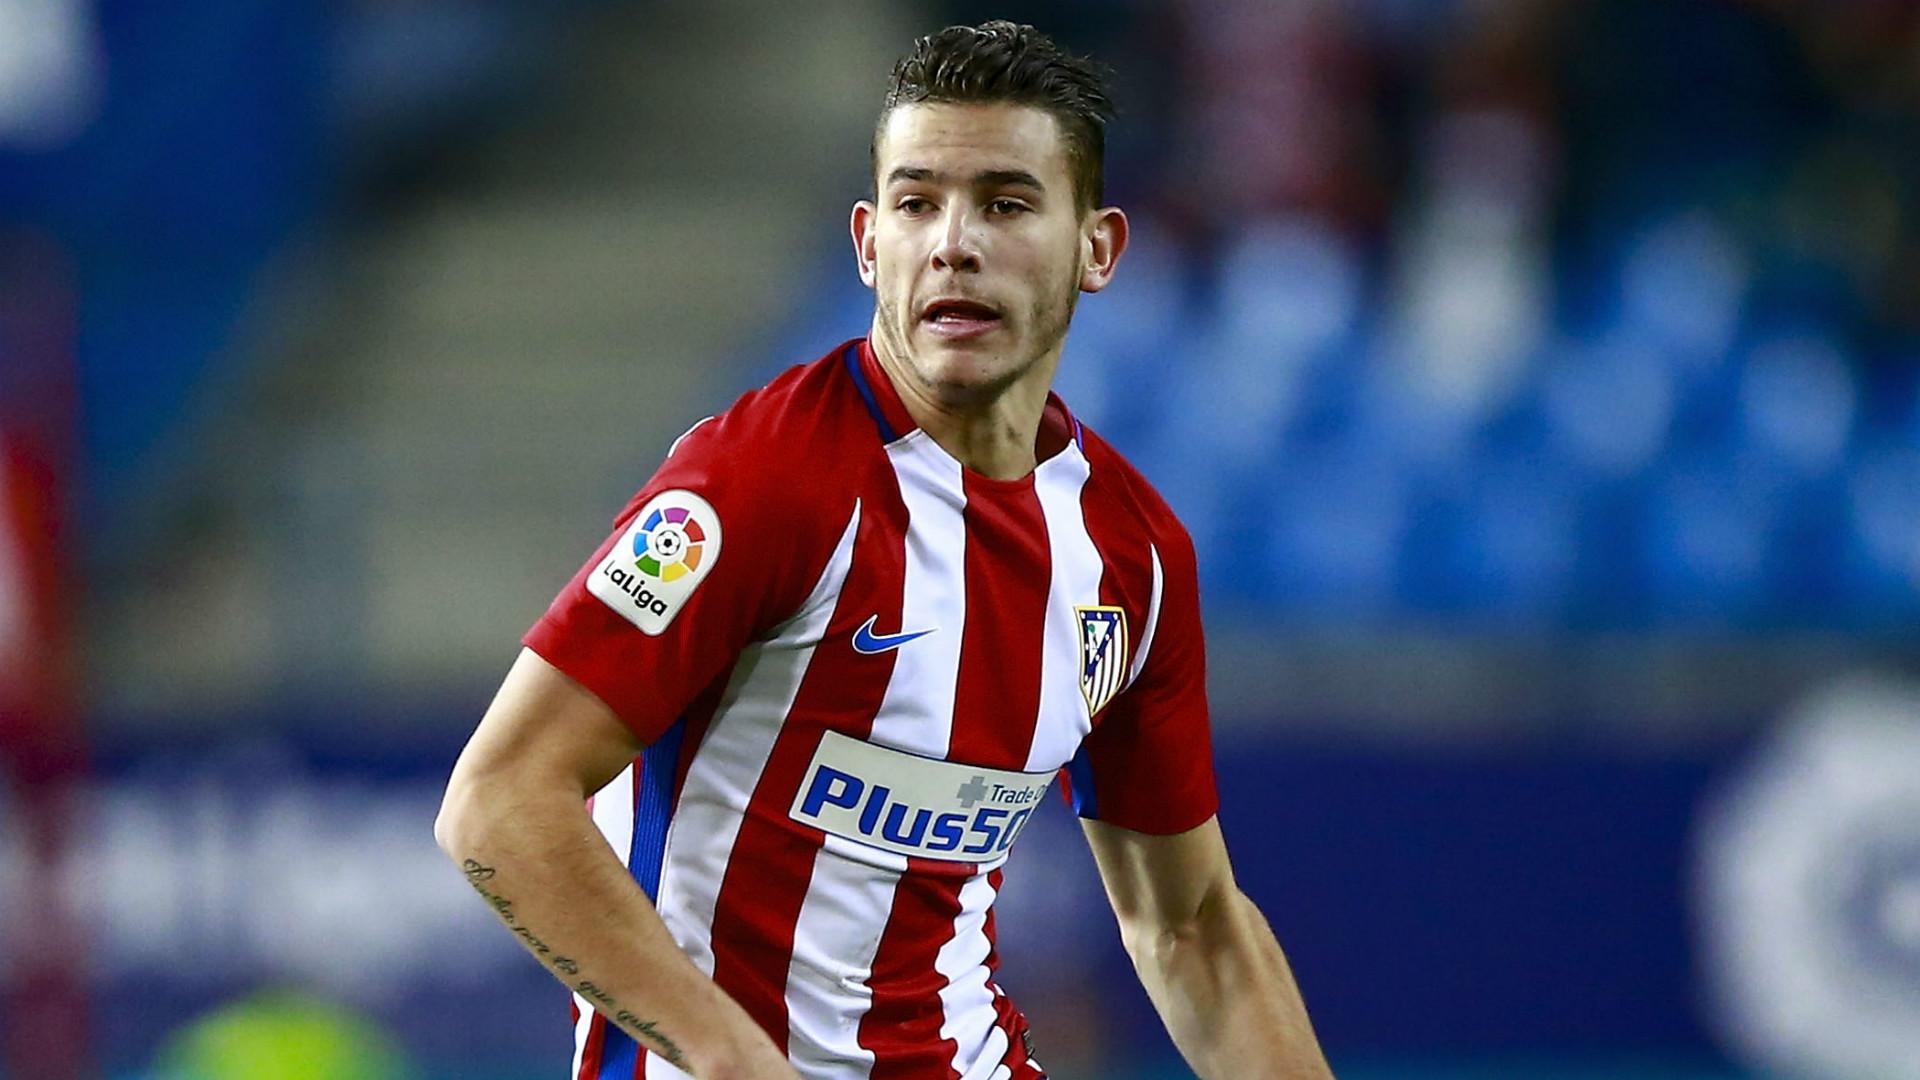 Camiseta Atlético de Madrid L. Hernández